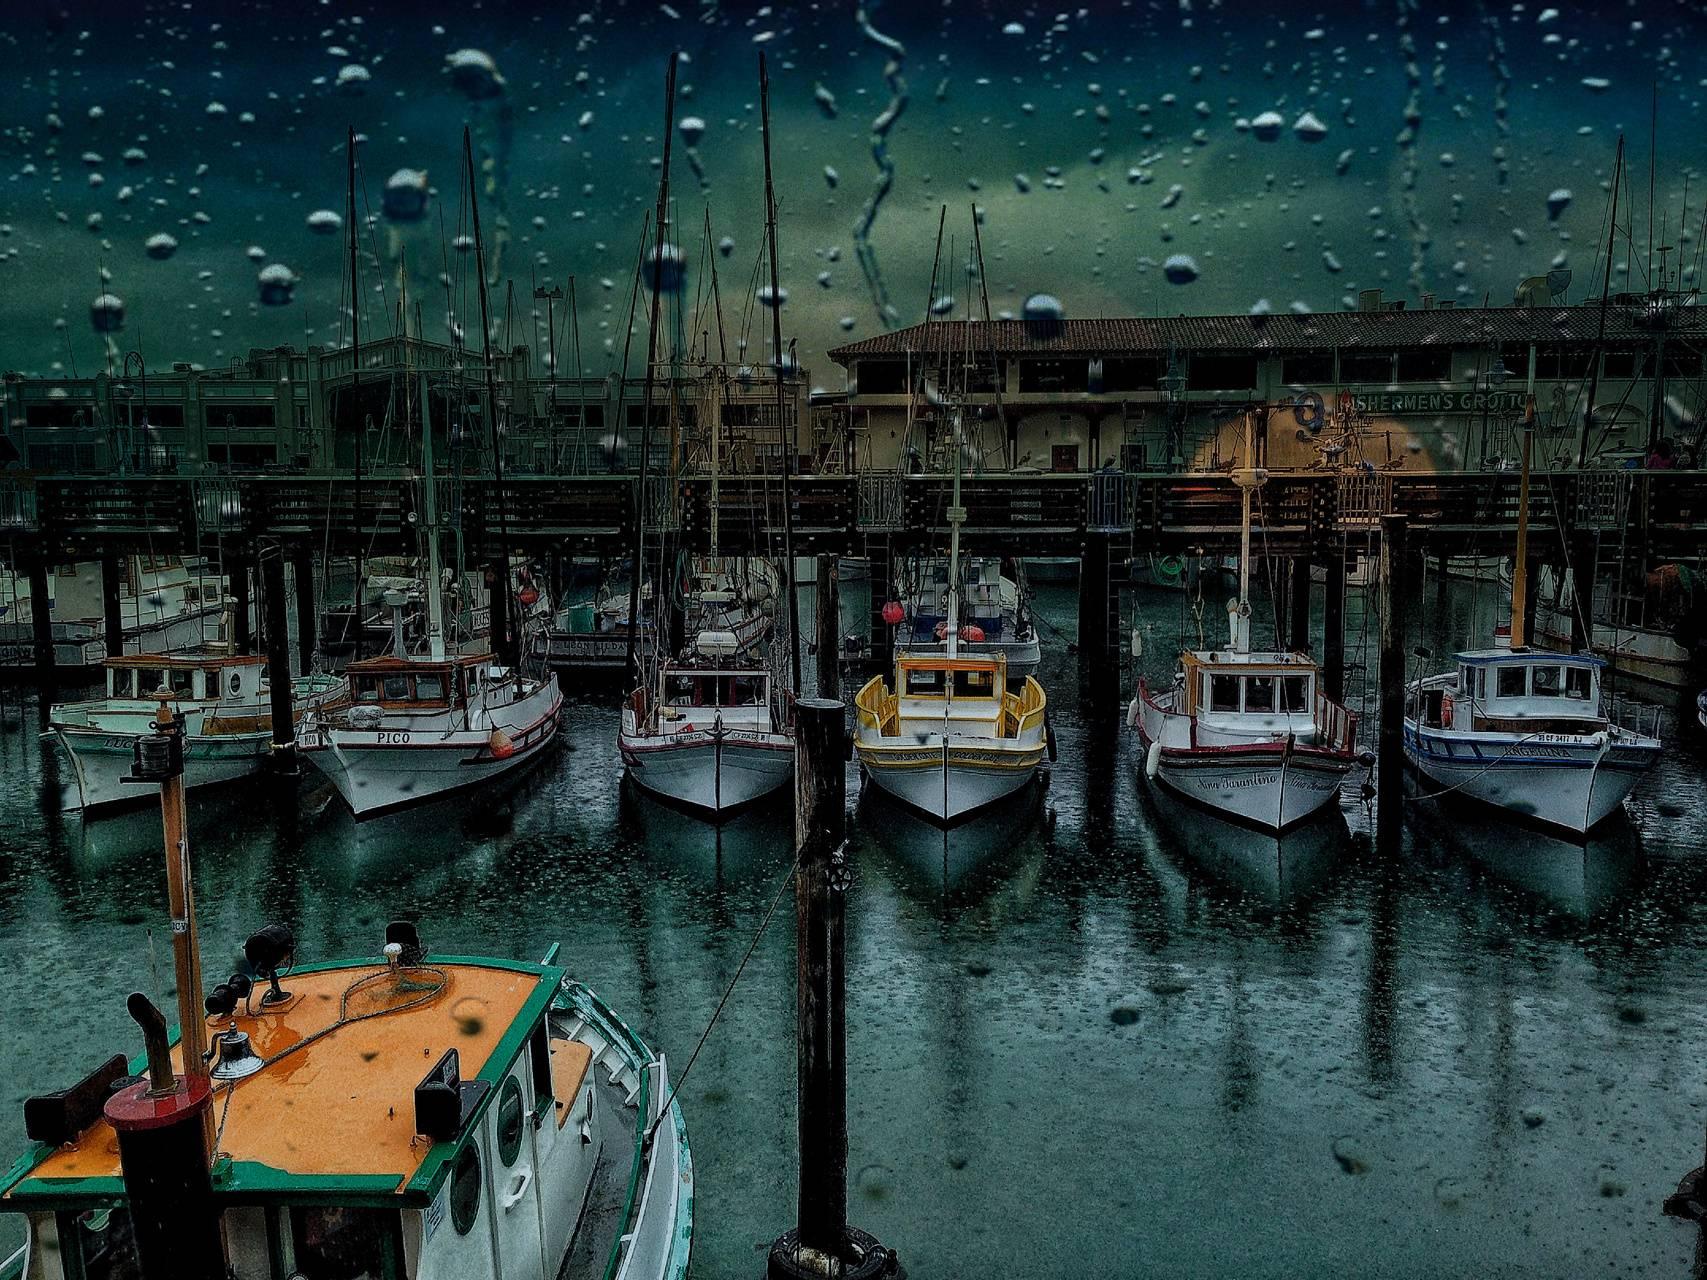 Rain Boat